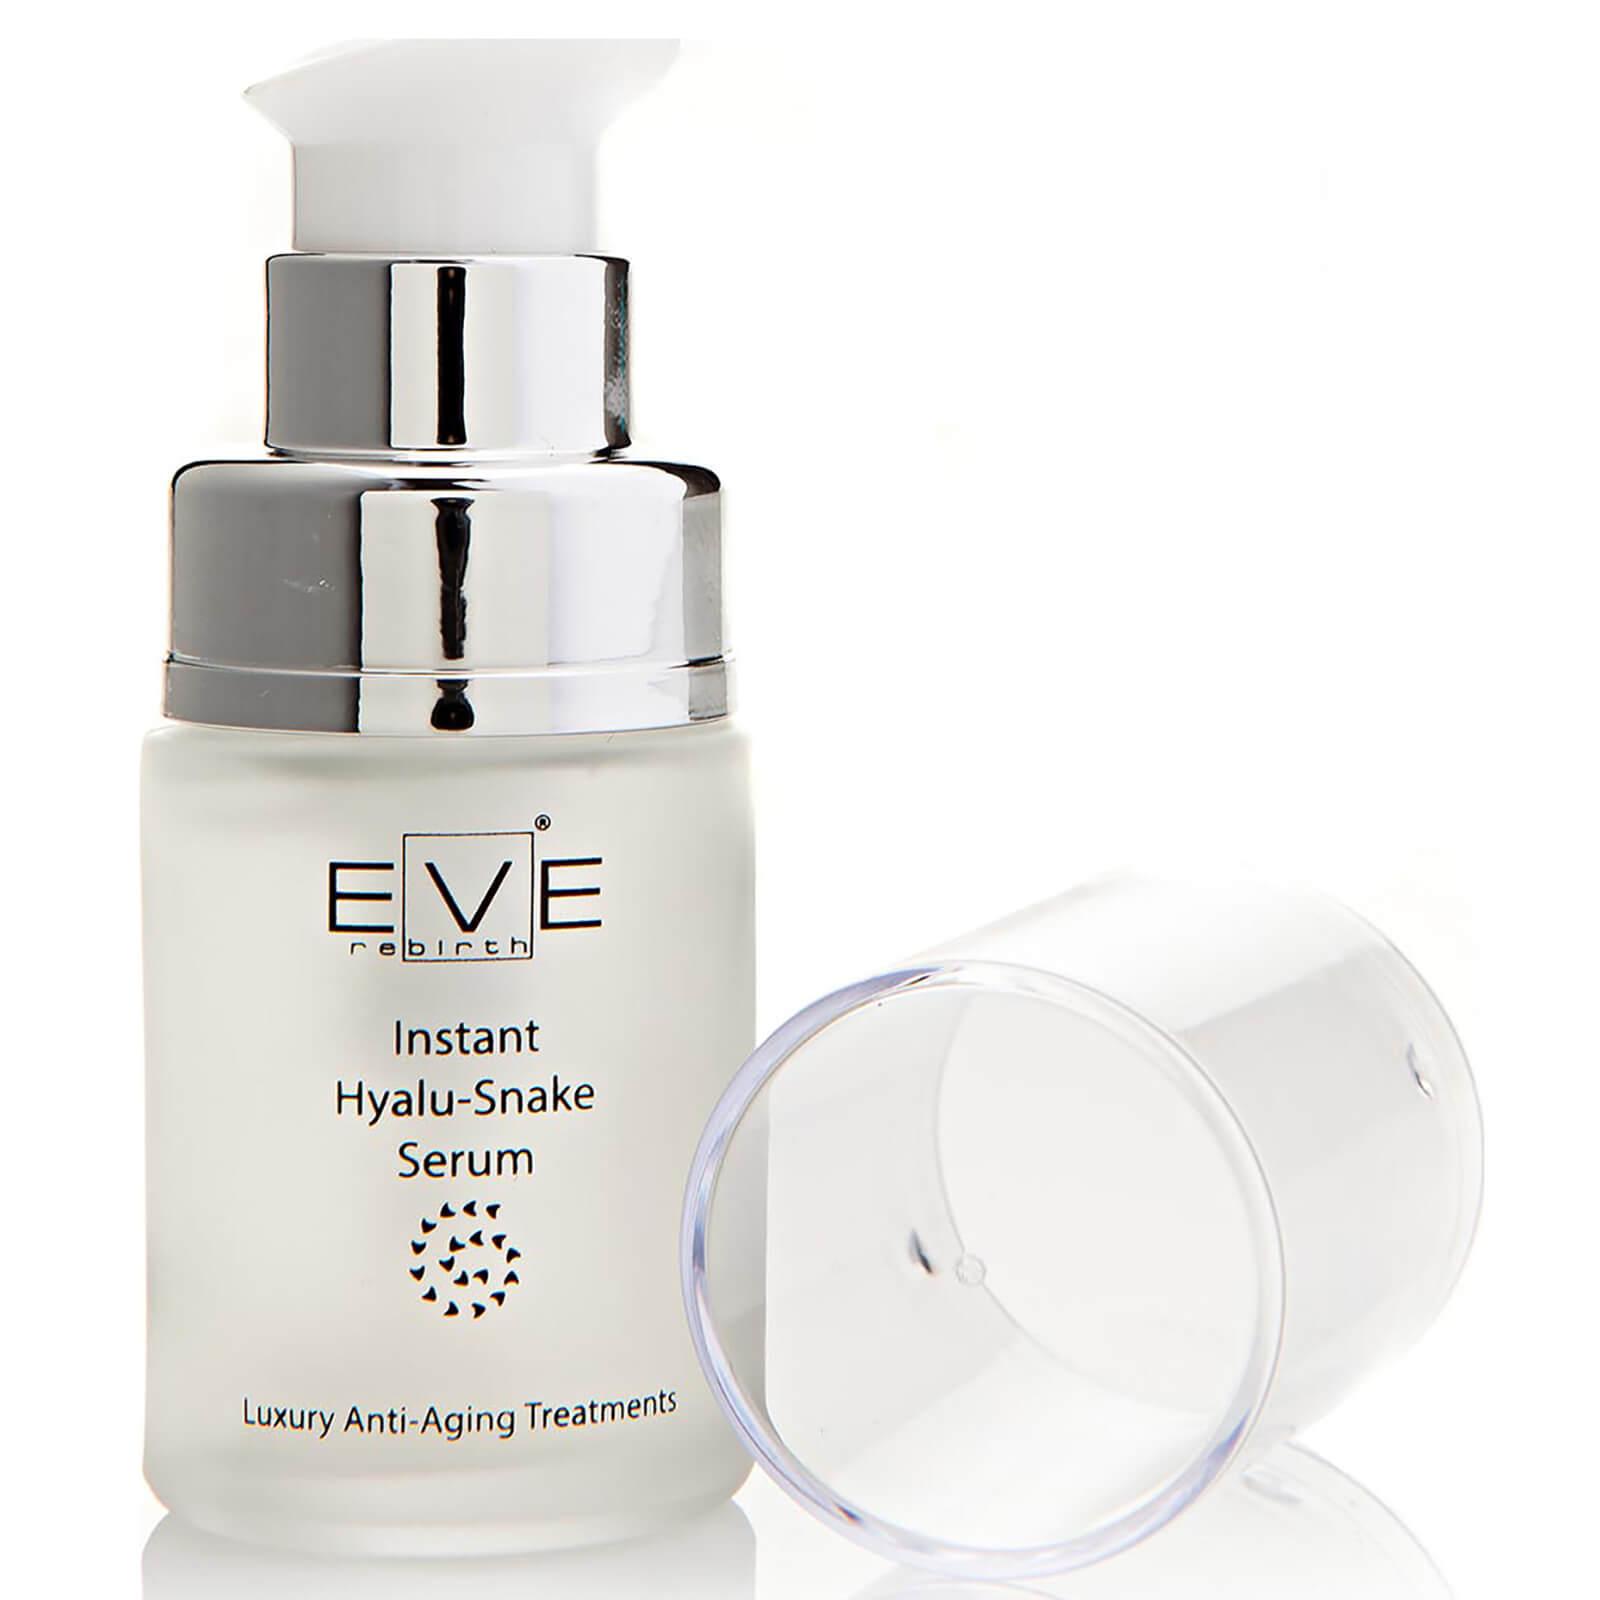 Eve Rebirth Instant Hyalu Snake Serum Beautyexpert Maxi Vanelia Apple 3in1 Product Description